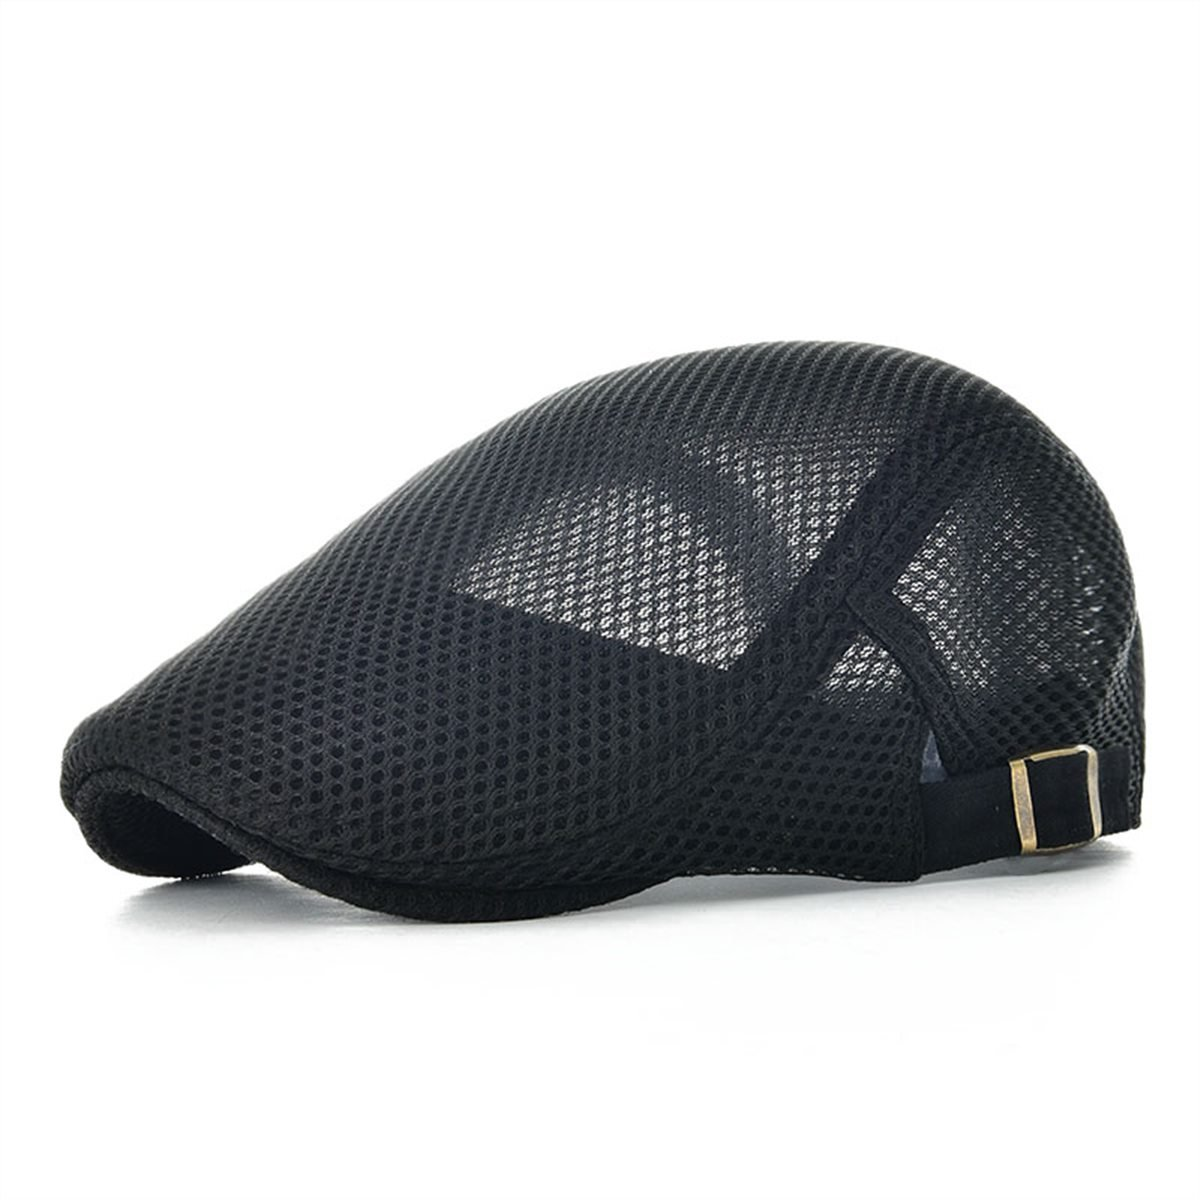 VOBOOM Men Breathable mesh Summer hat Adjustable Newsboy Beret Ivy Cap  Cabbie Flat Cap MZ124 (Black) at Amazon Men s Clothing store  c4bf802ba5d